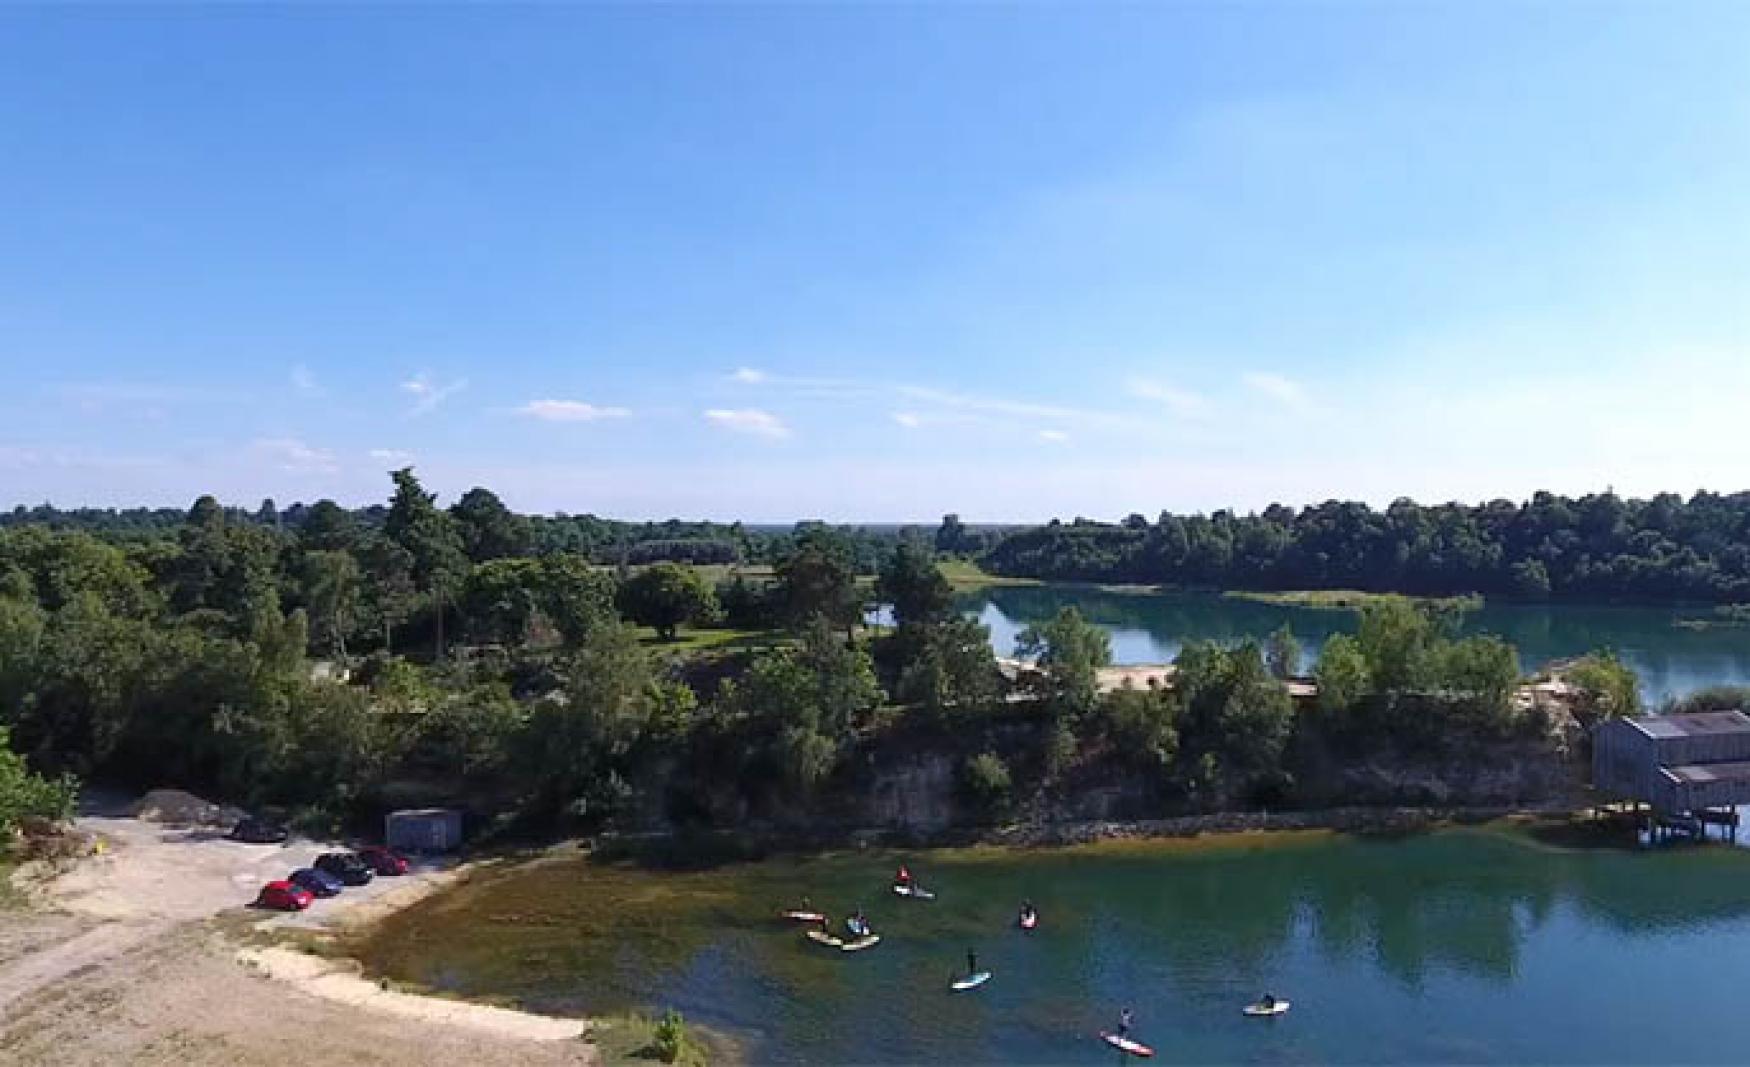 buckland-park-lake-drone-4